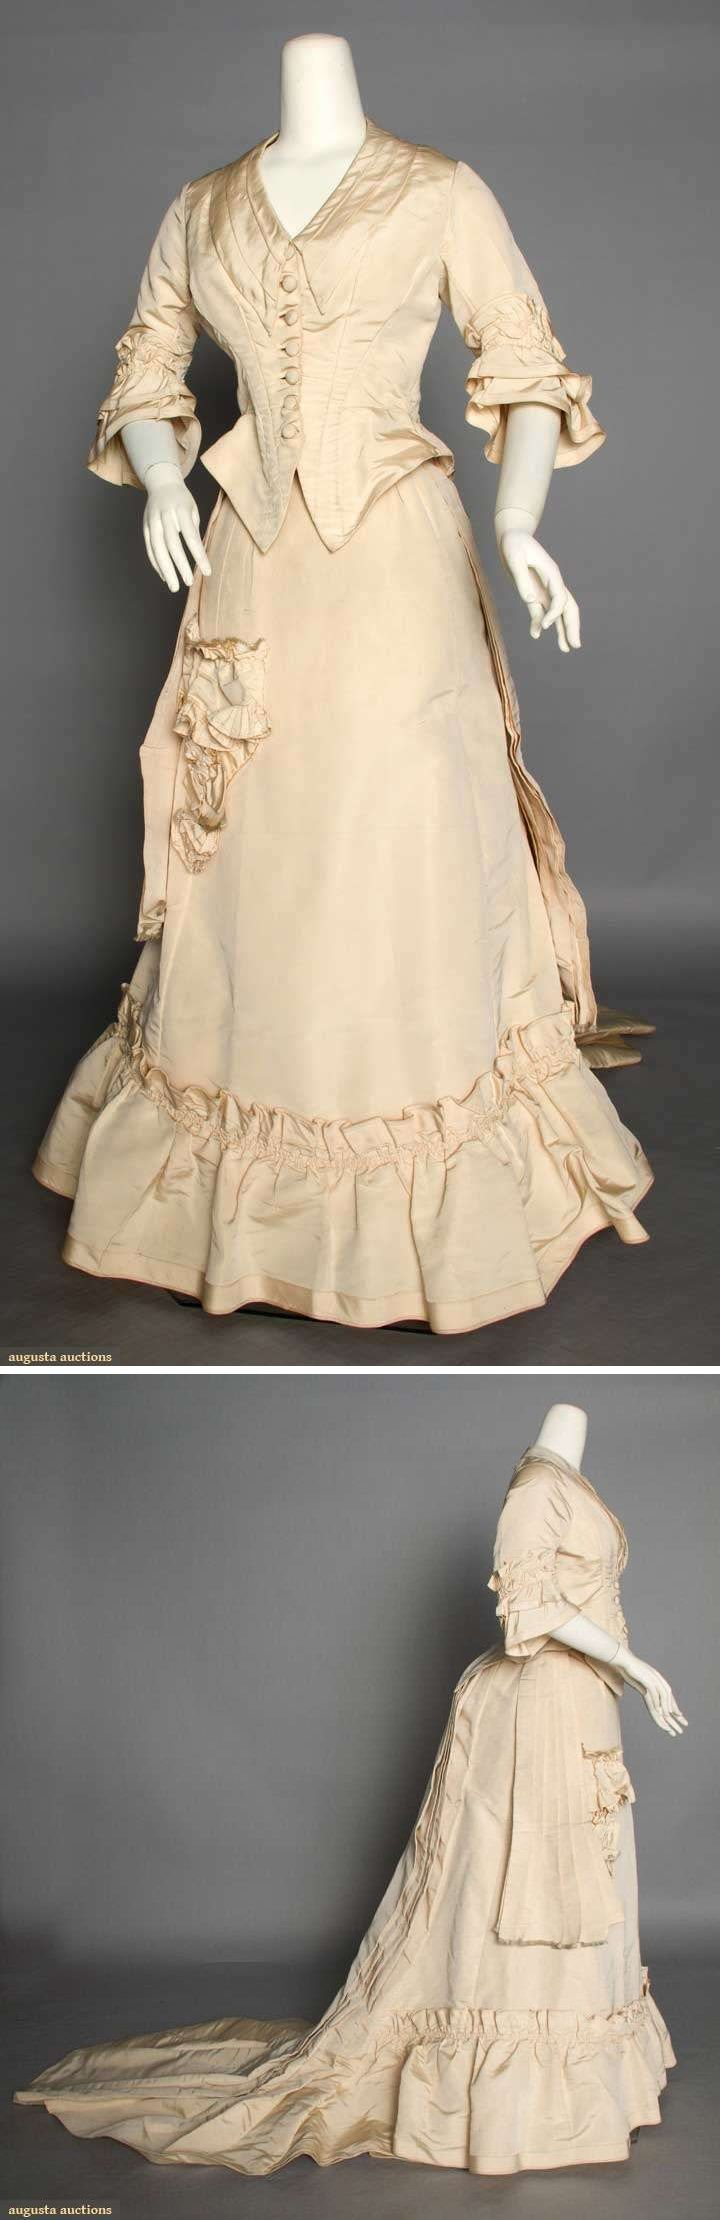 CREAM SILK WEDDING DRESS, 1875